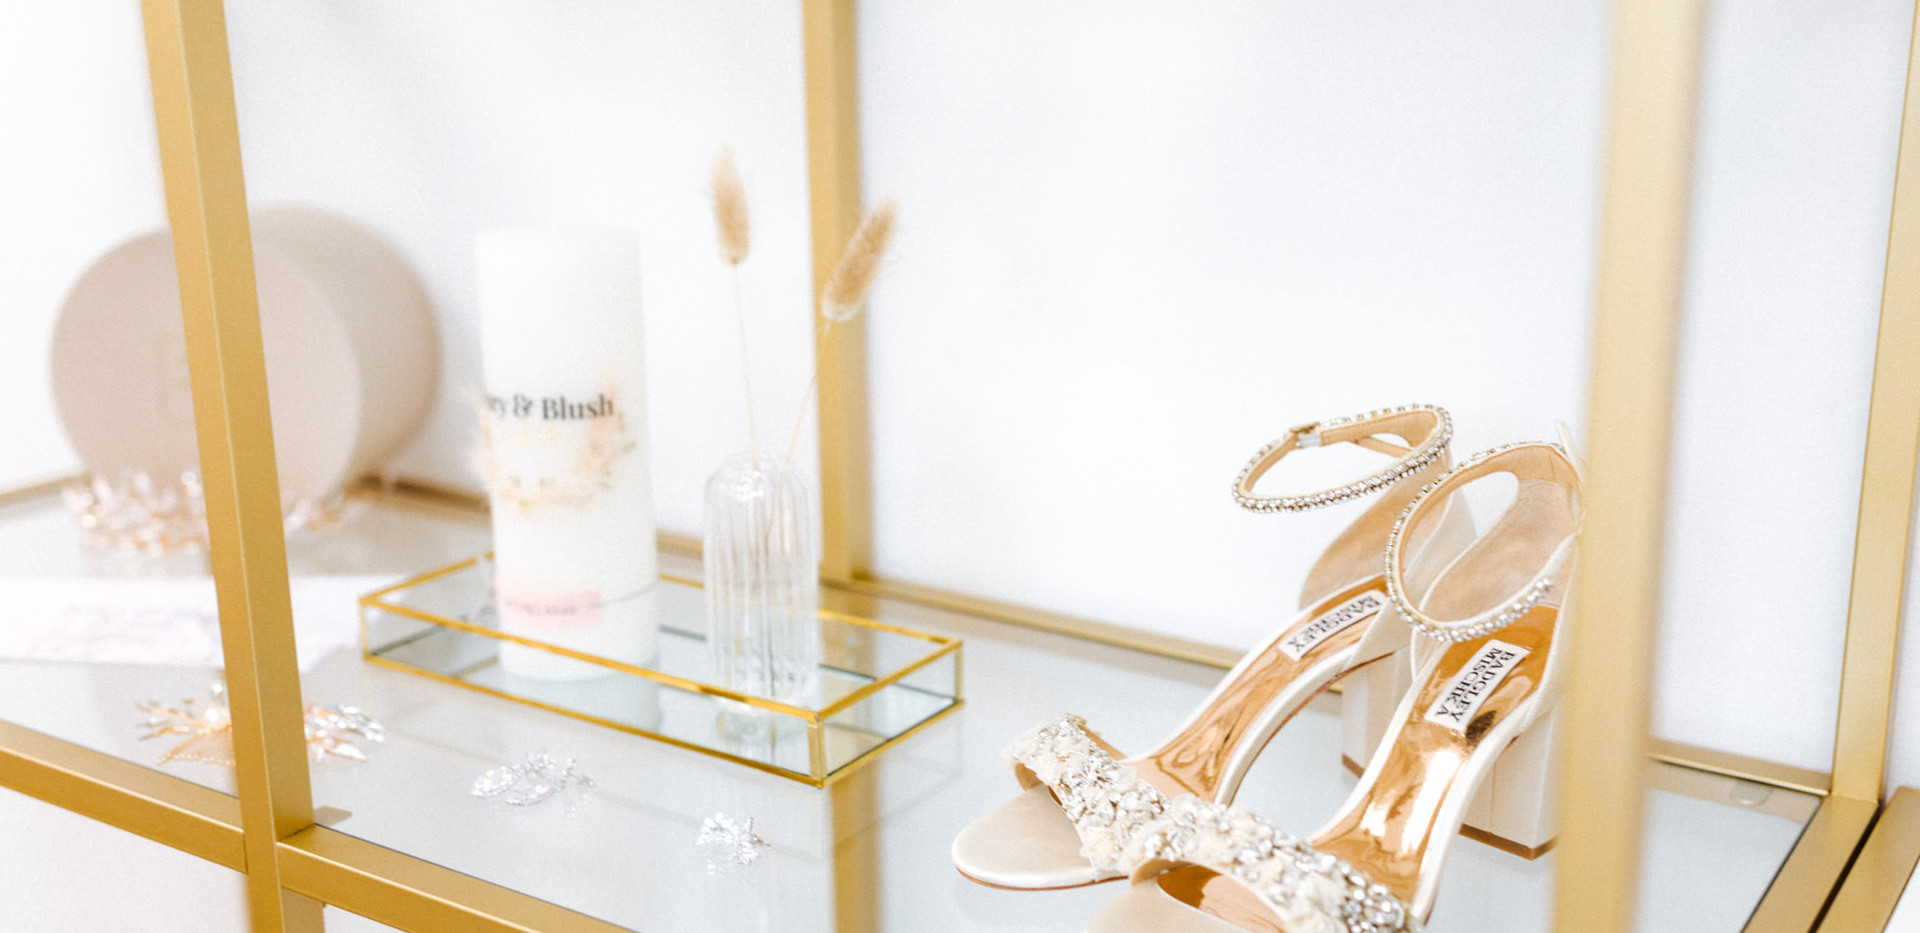 Unser Bridal Concept Store Ivory & Blush